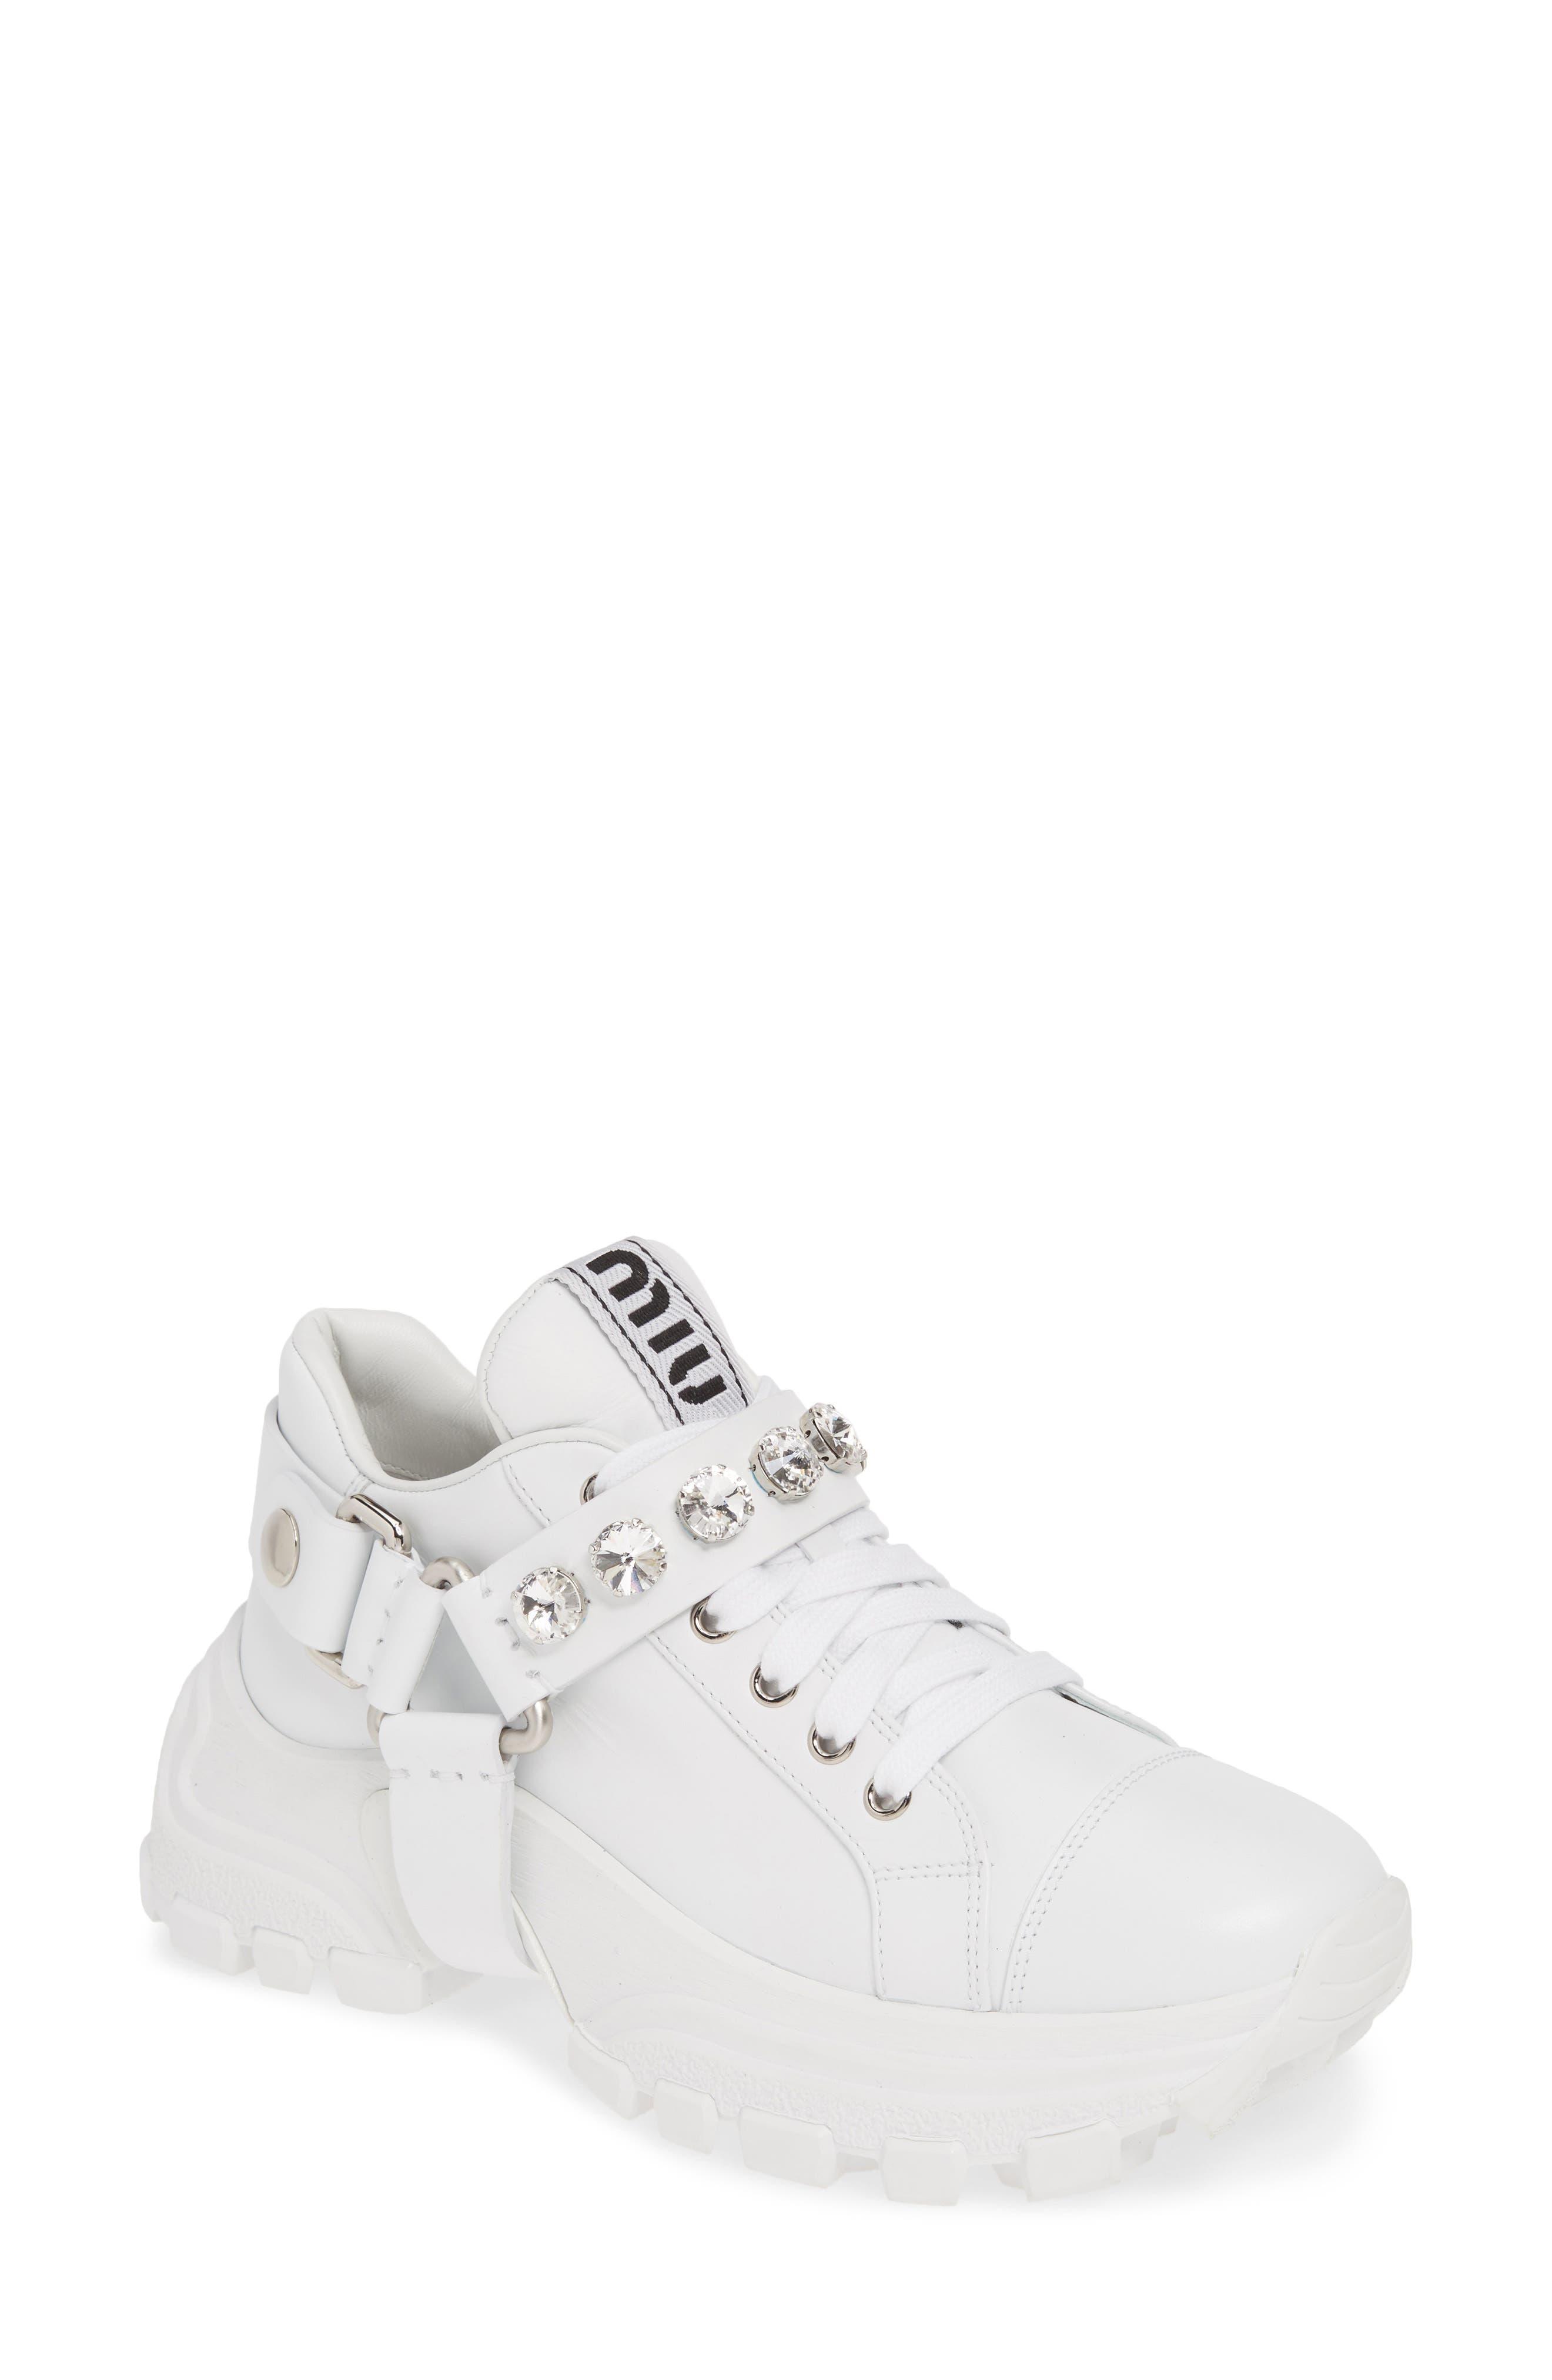 Miu Miu Crystal Harness Platform Sneaker - White